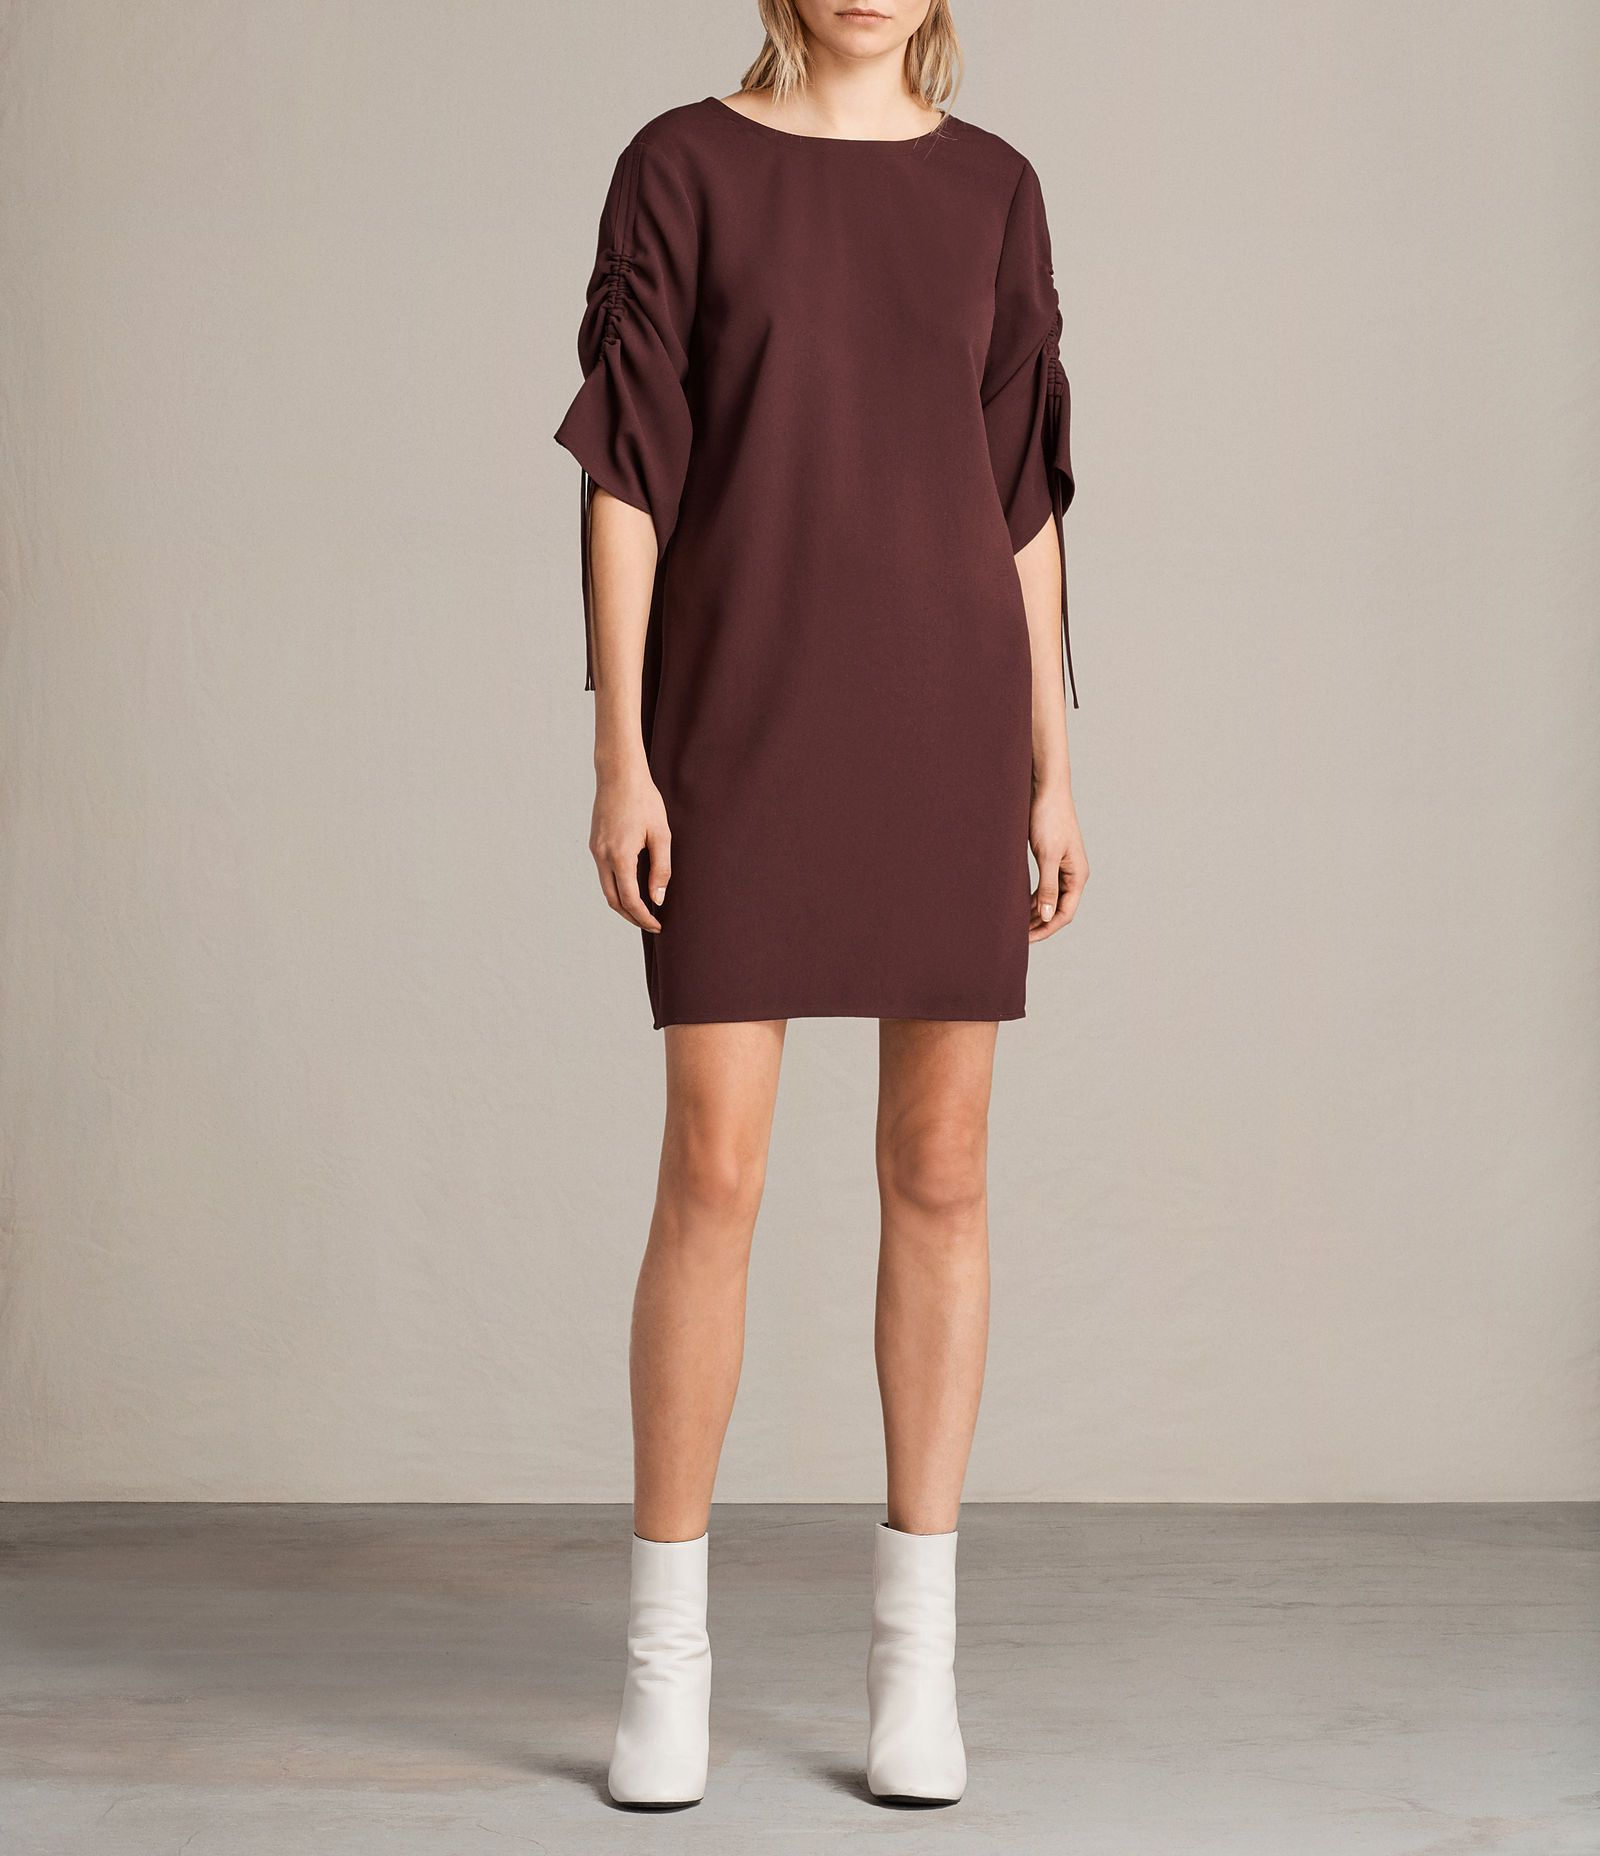 ALLSAINTS UK: Womens Evie Dress (BORDEAUX RED) | šití šaty